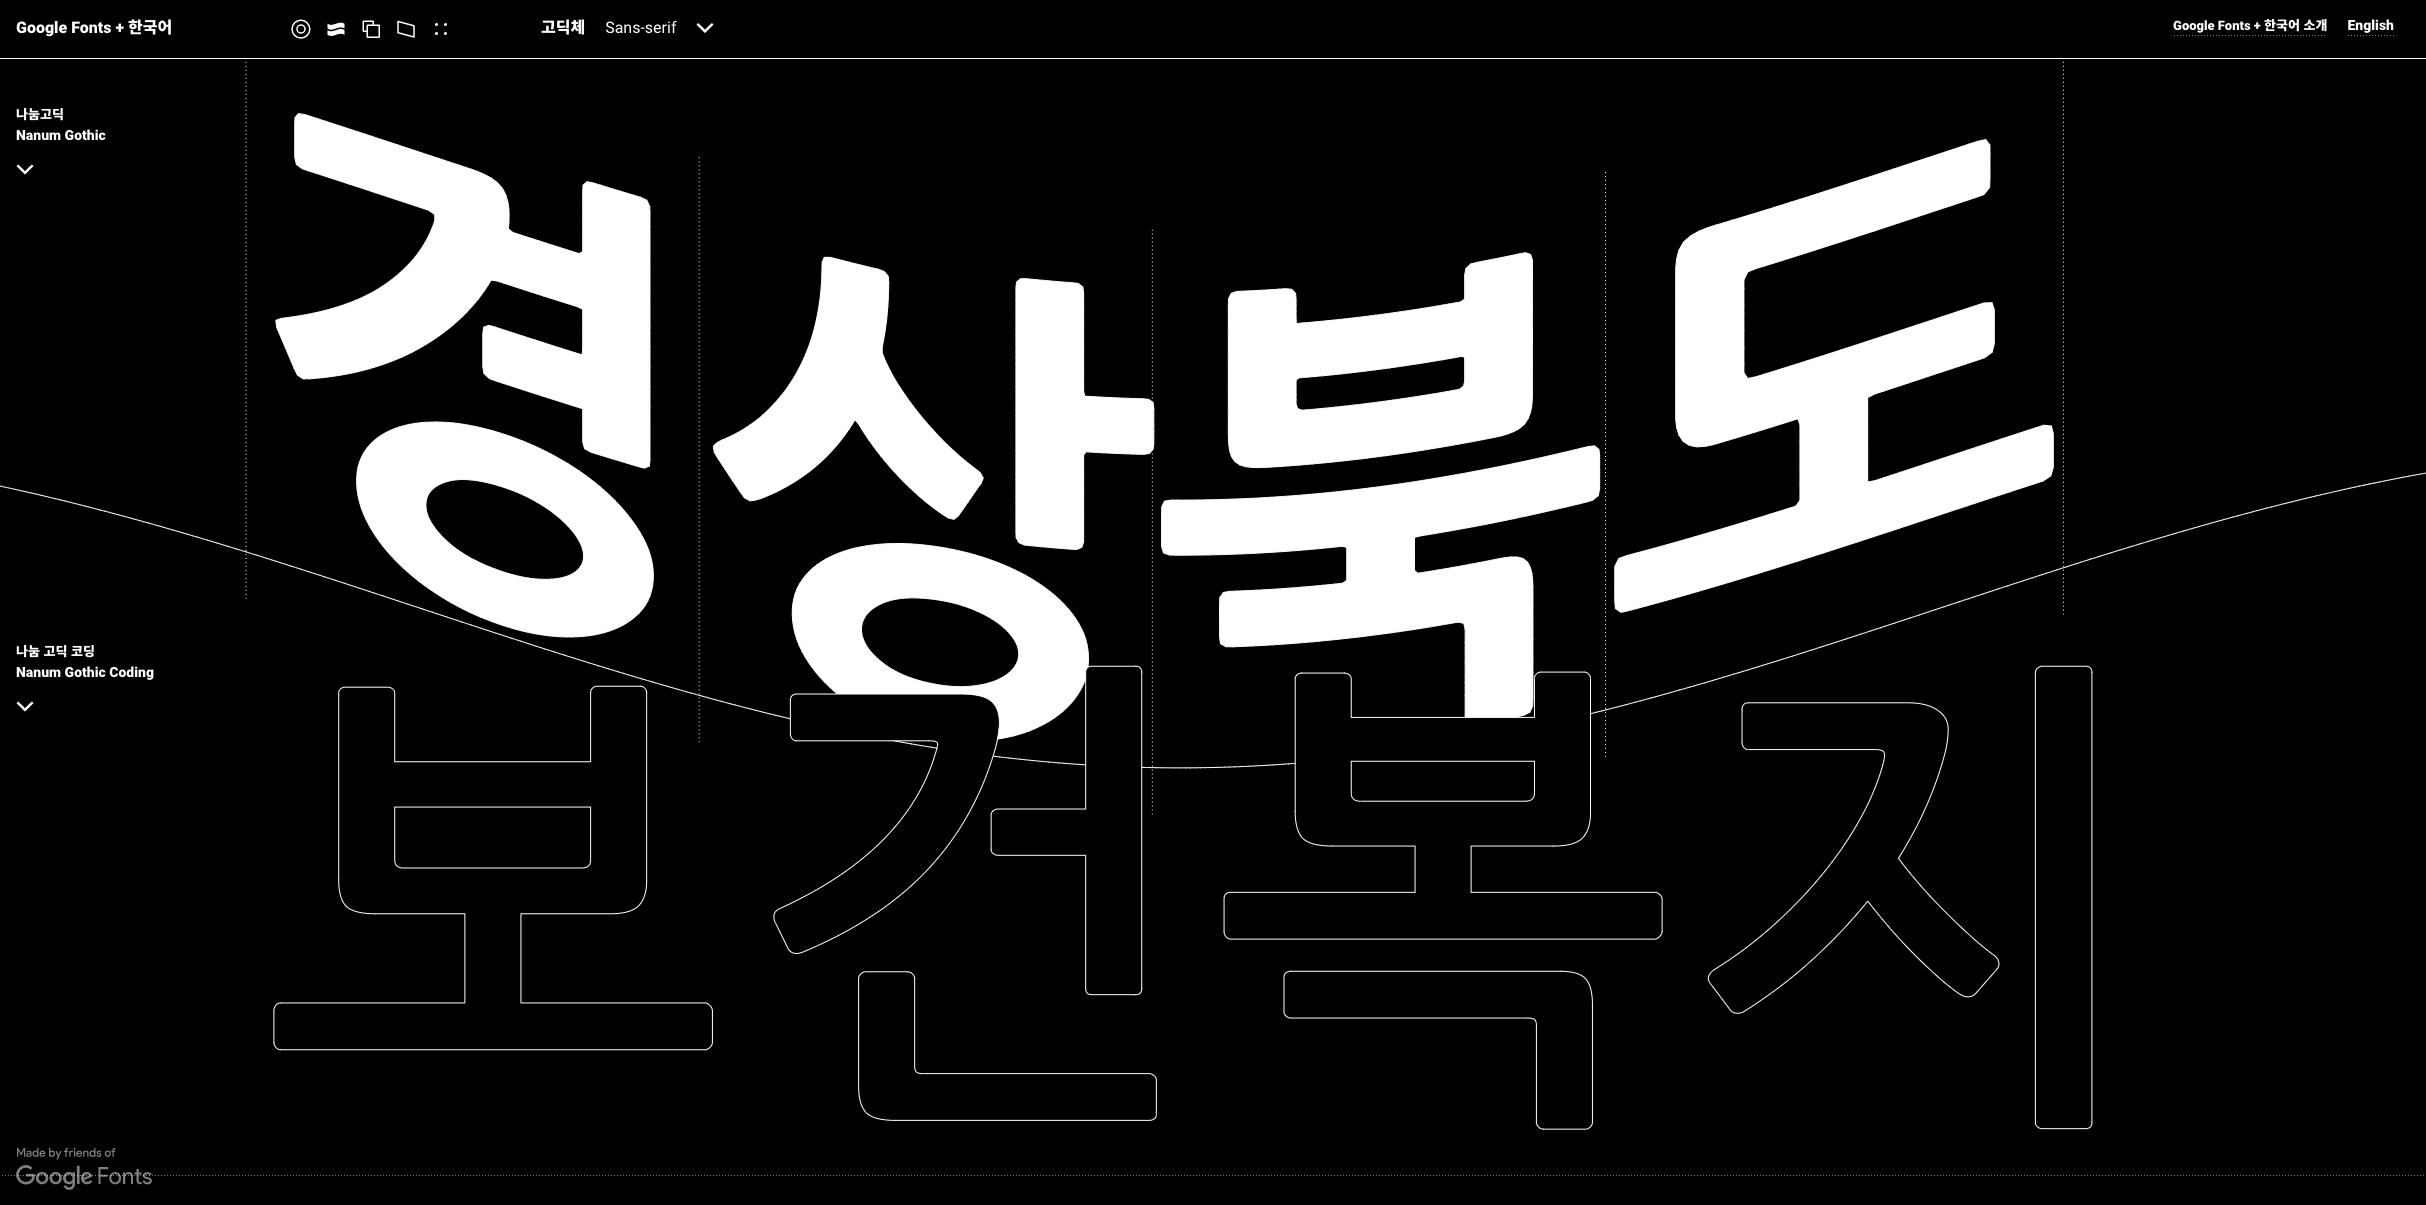 google-fonts-korean-graphic-design-2.png